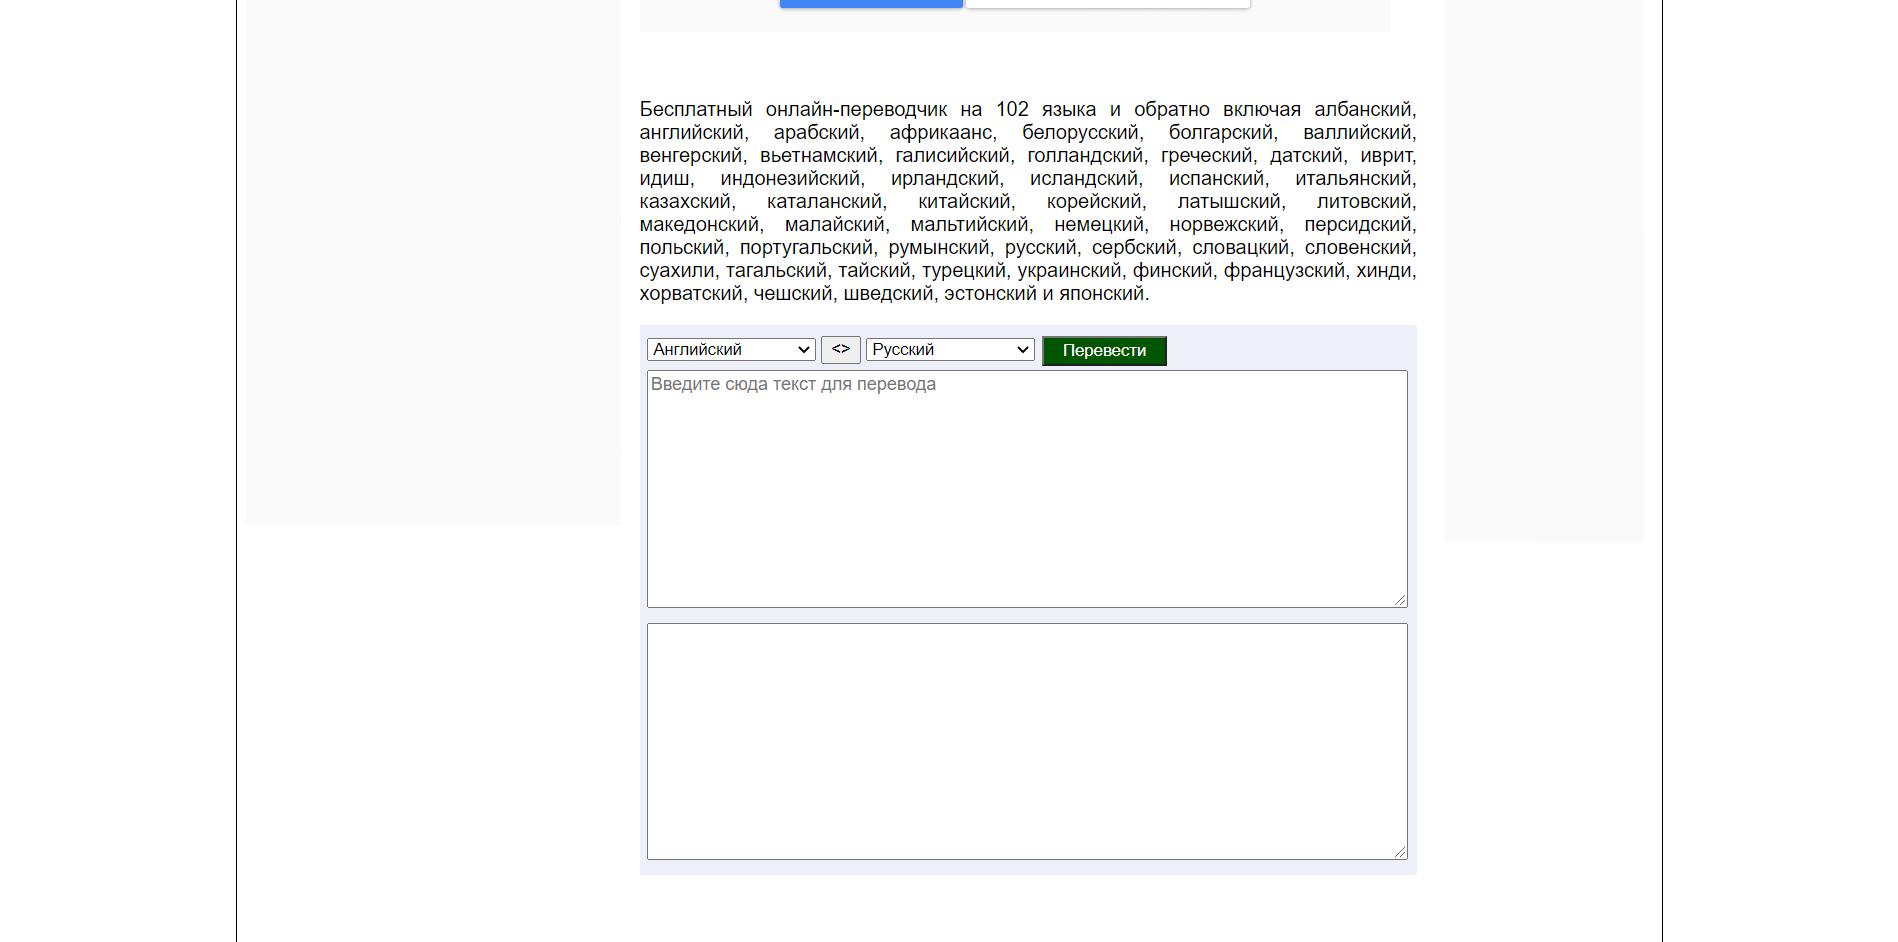 Webtran интерфейс